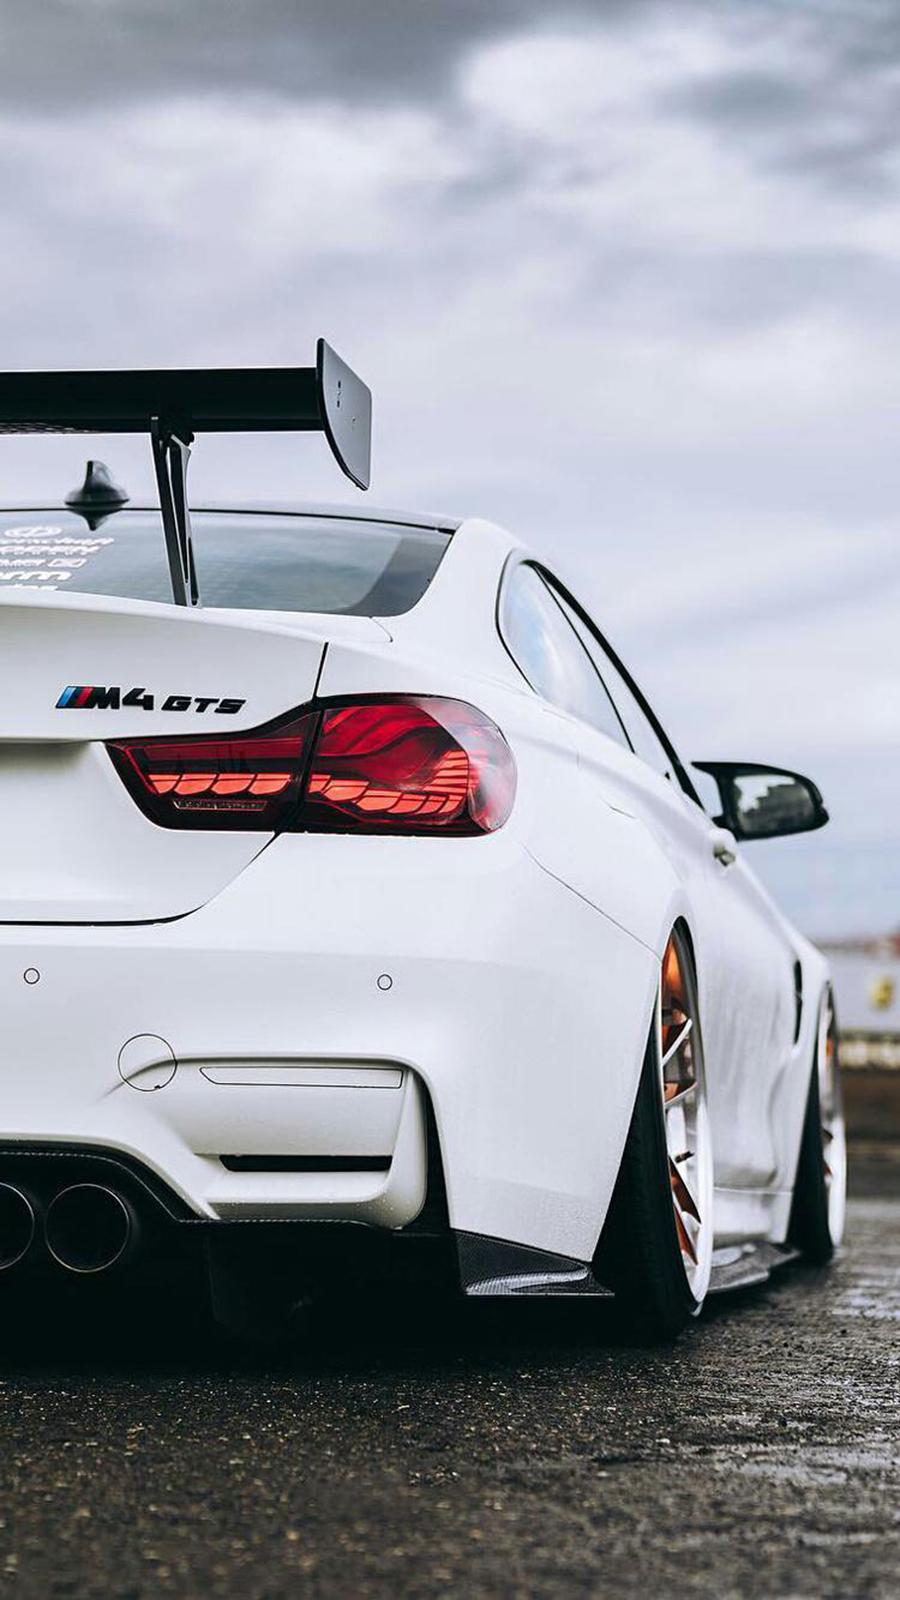 Racing Bmw Wallpaper – Most Popular BMW Wallpapers Free Download